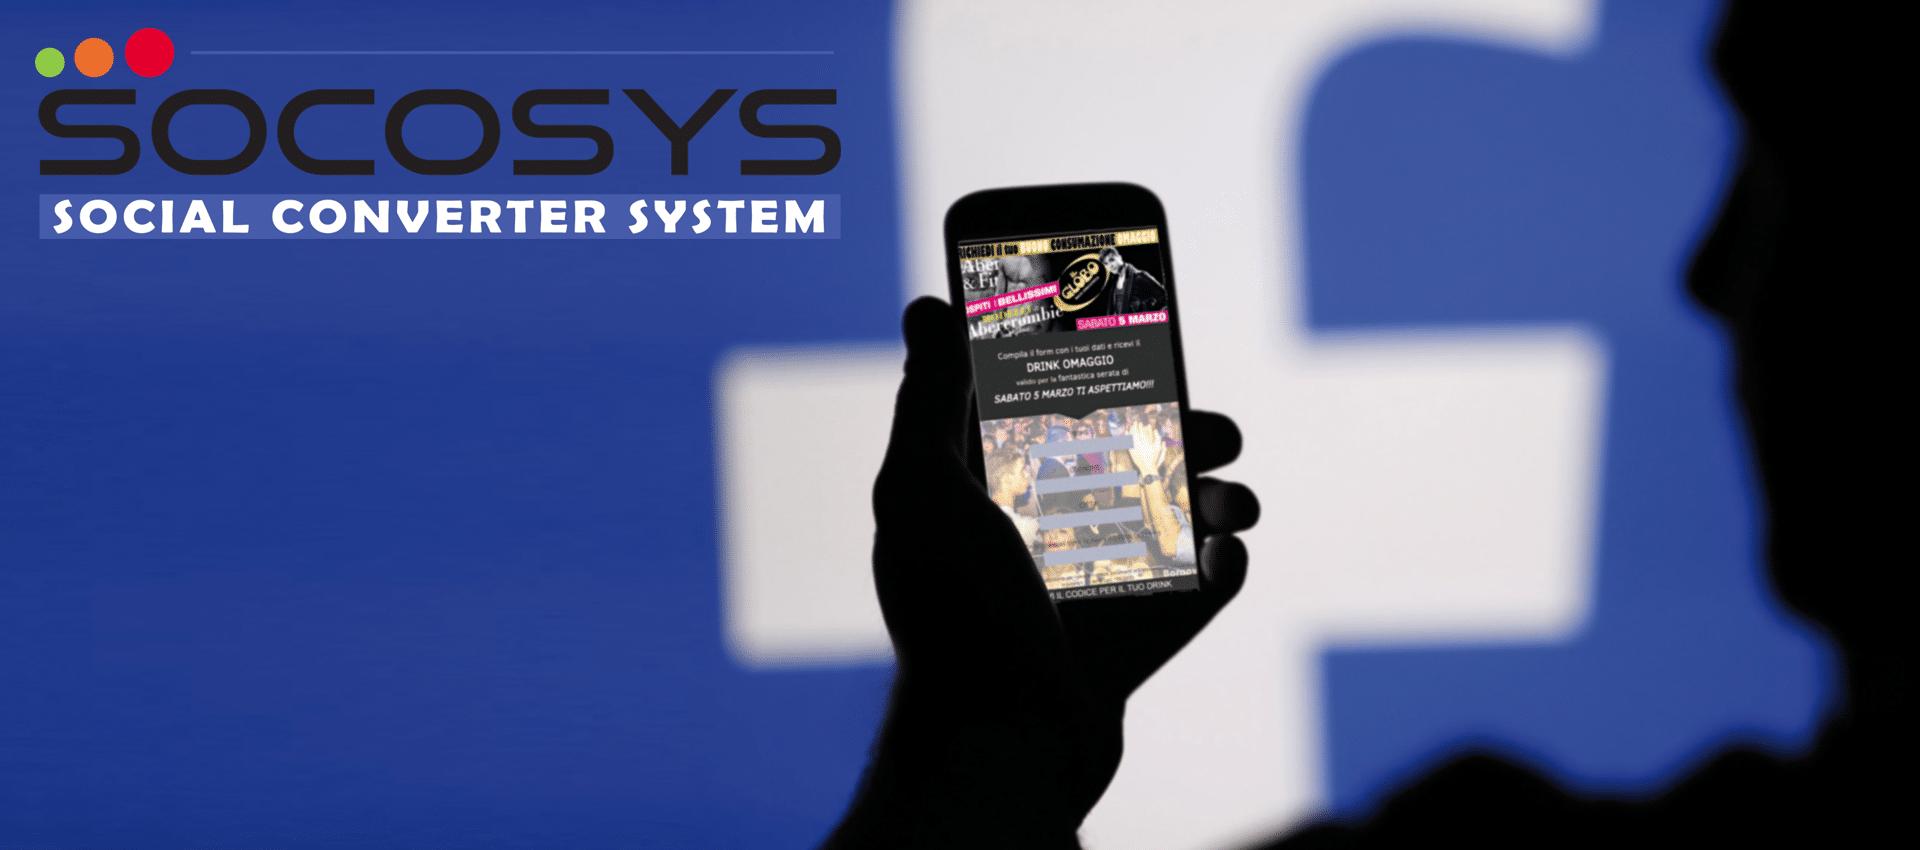 agicoom web social converter system